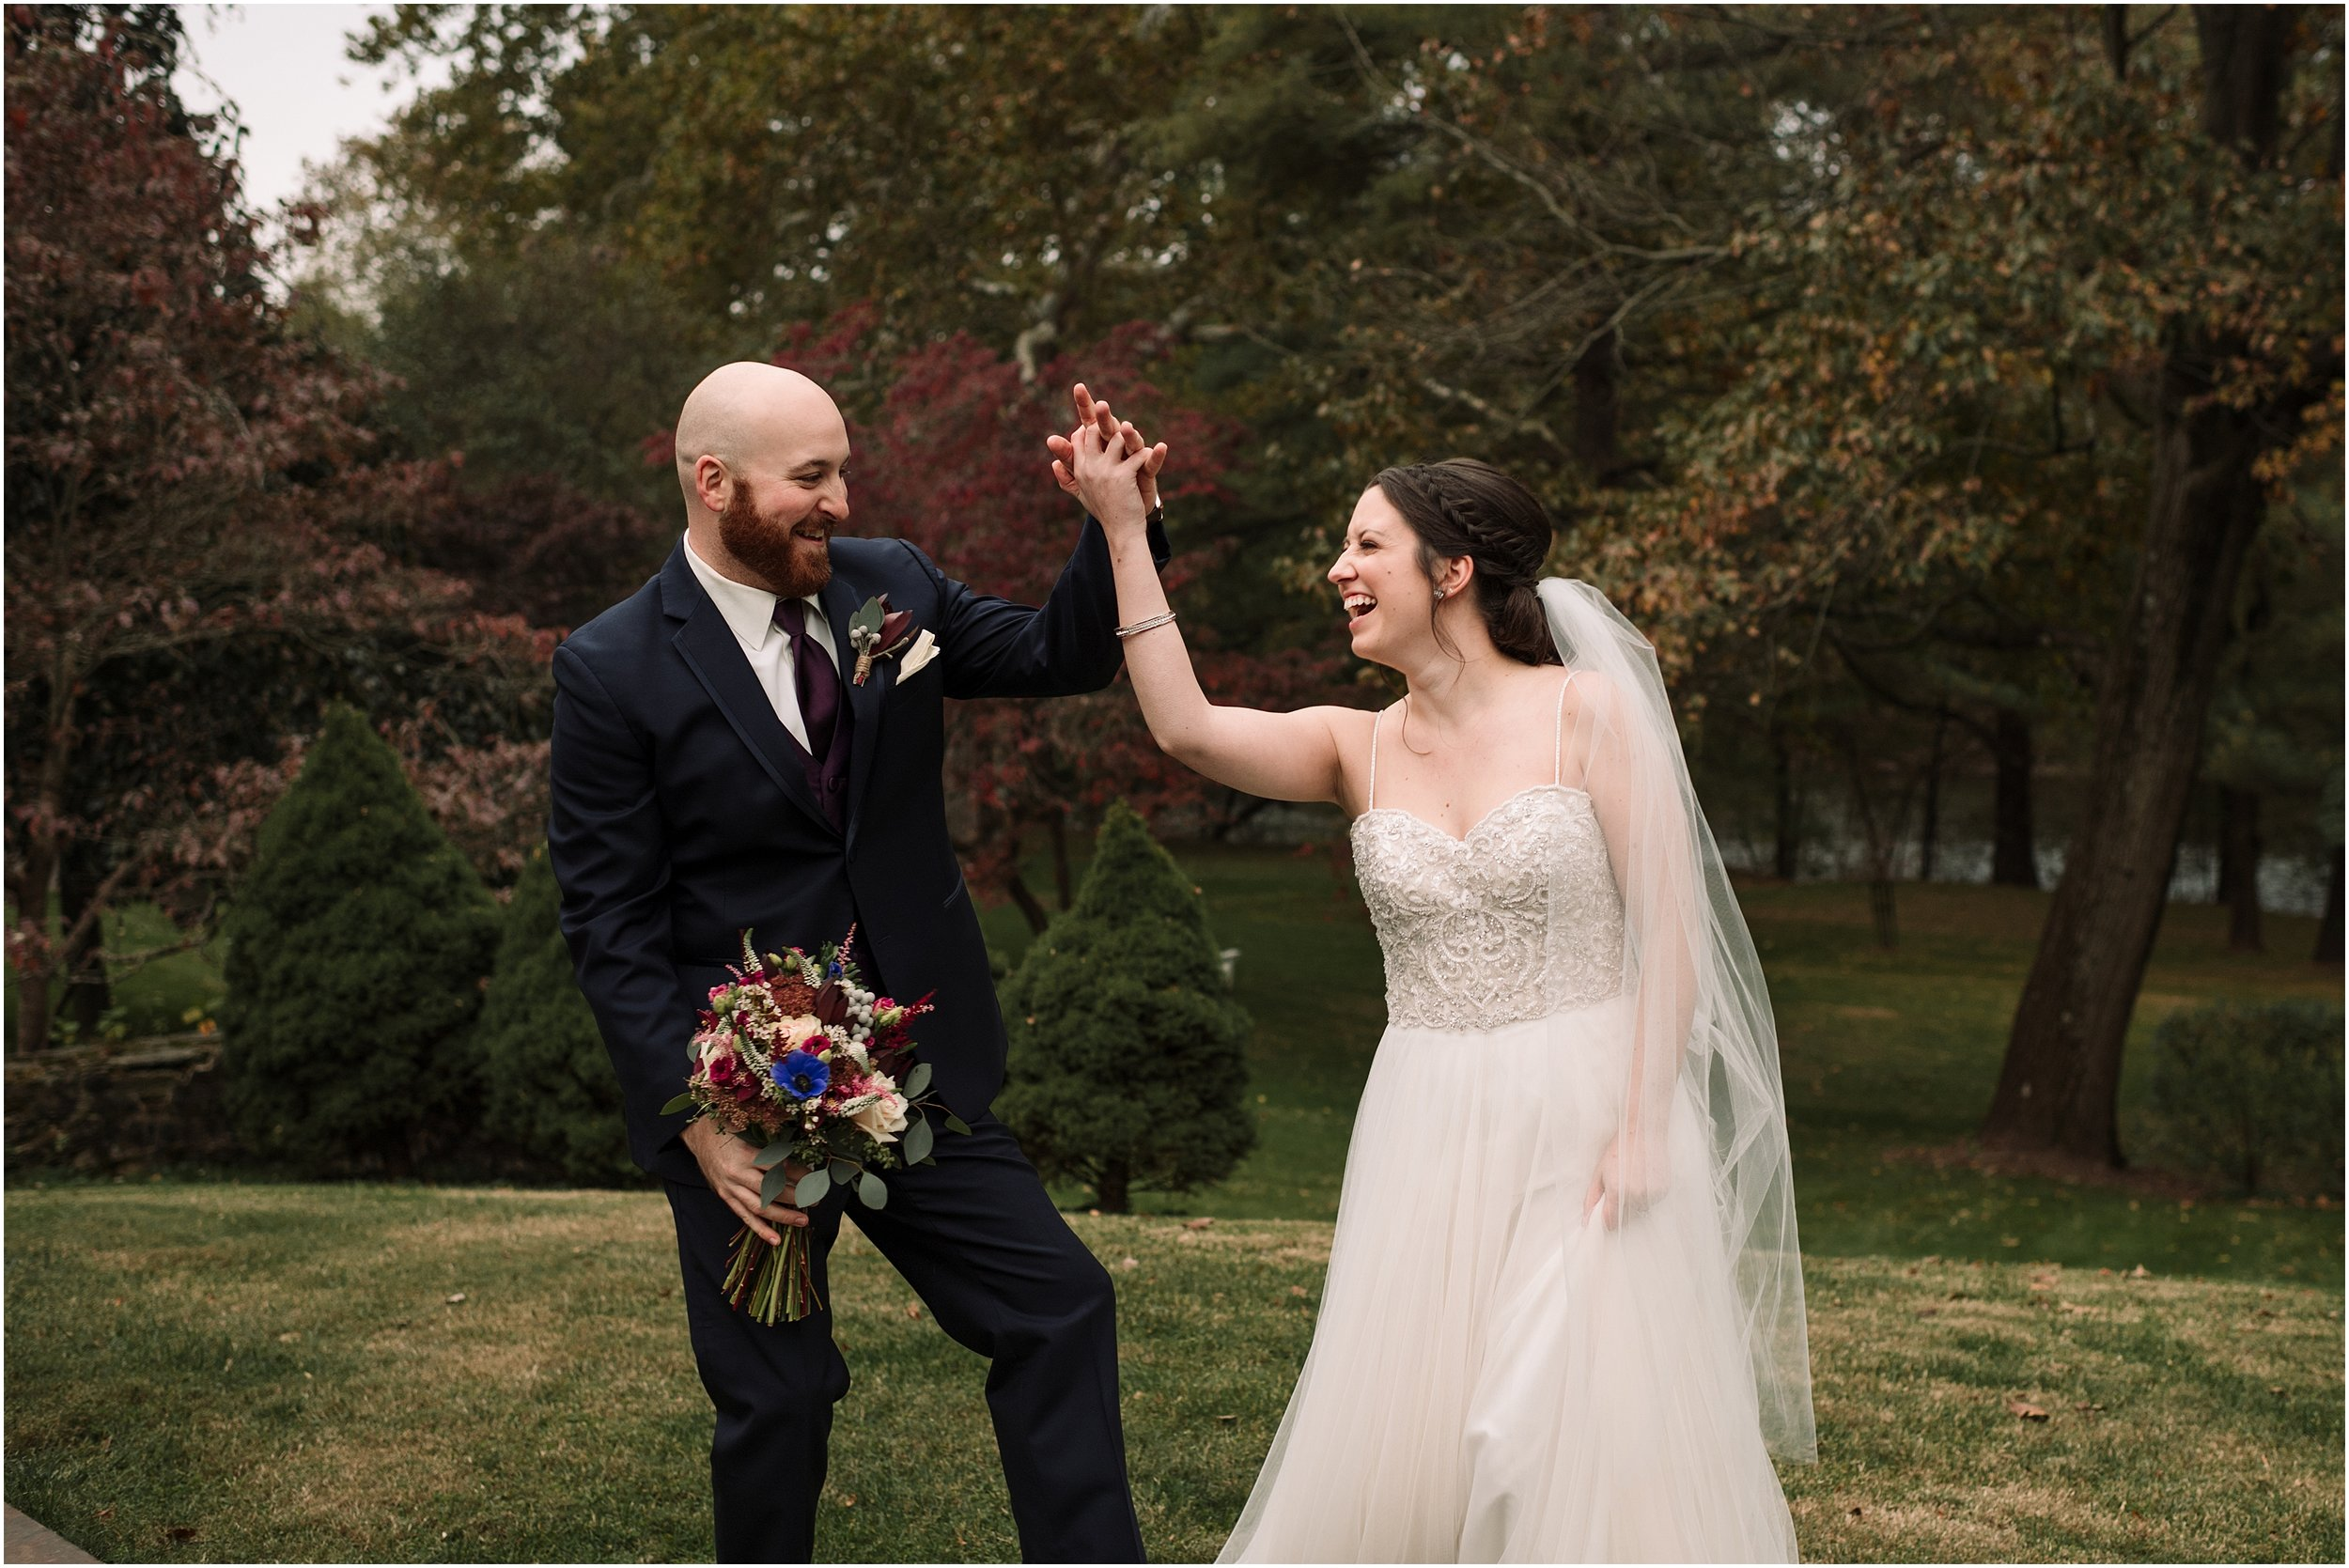 hannah leigh photography riverdale manor wedding lancaster pa_2025.jpg